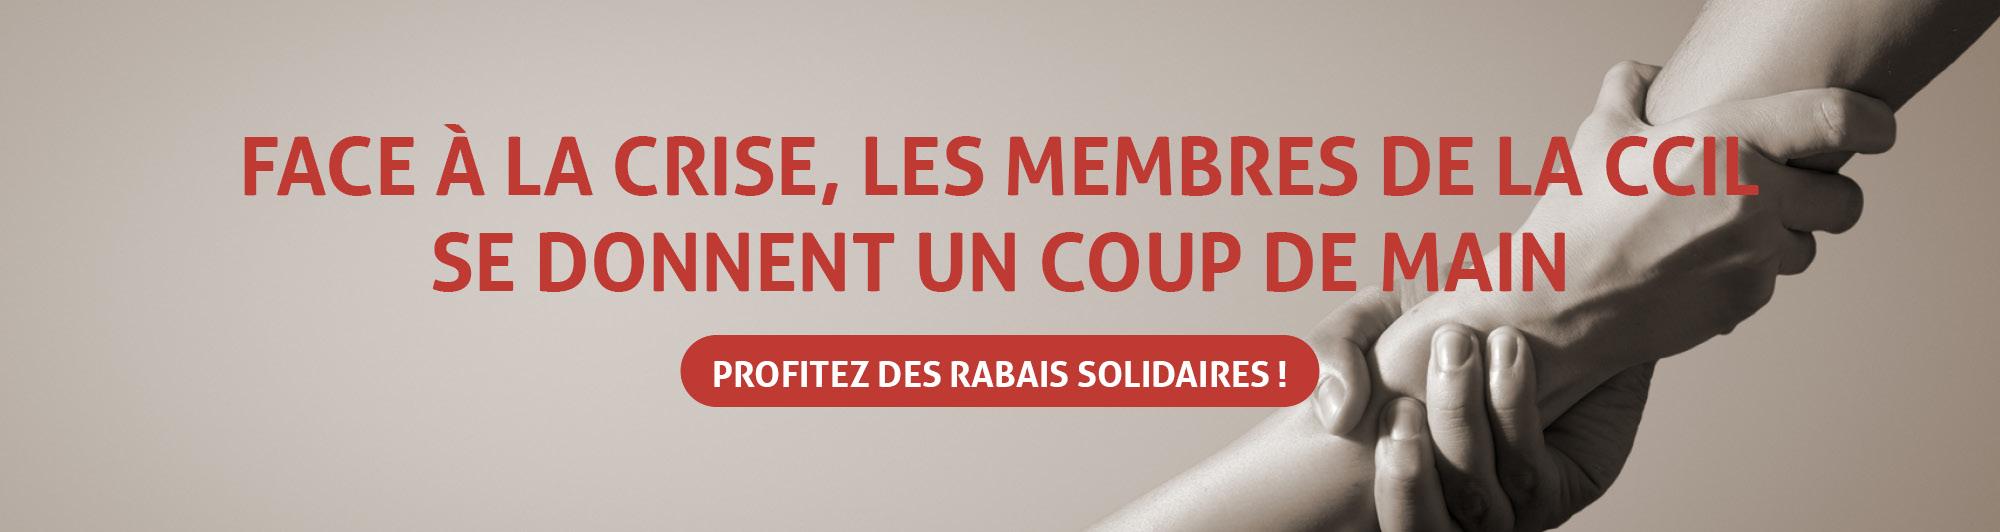 Les rabais solidaires des membres de la CCIL